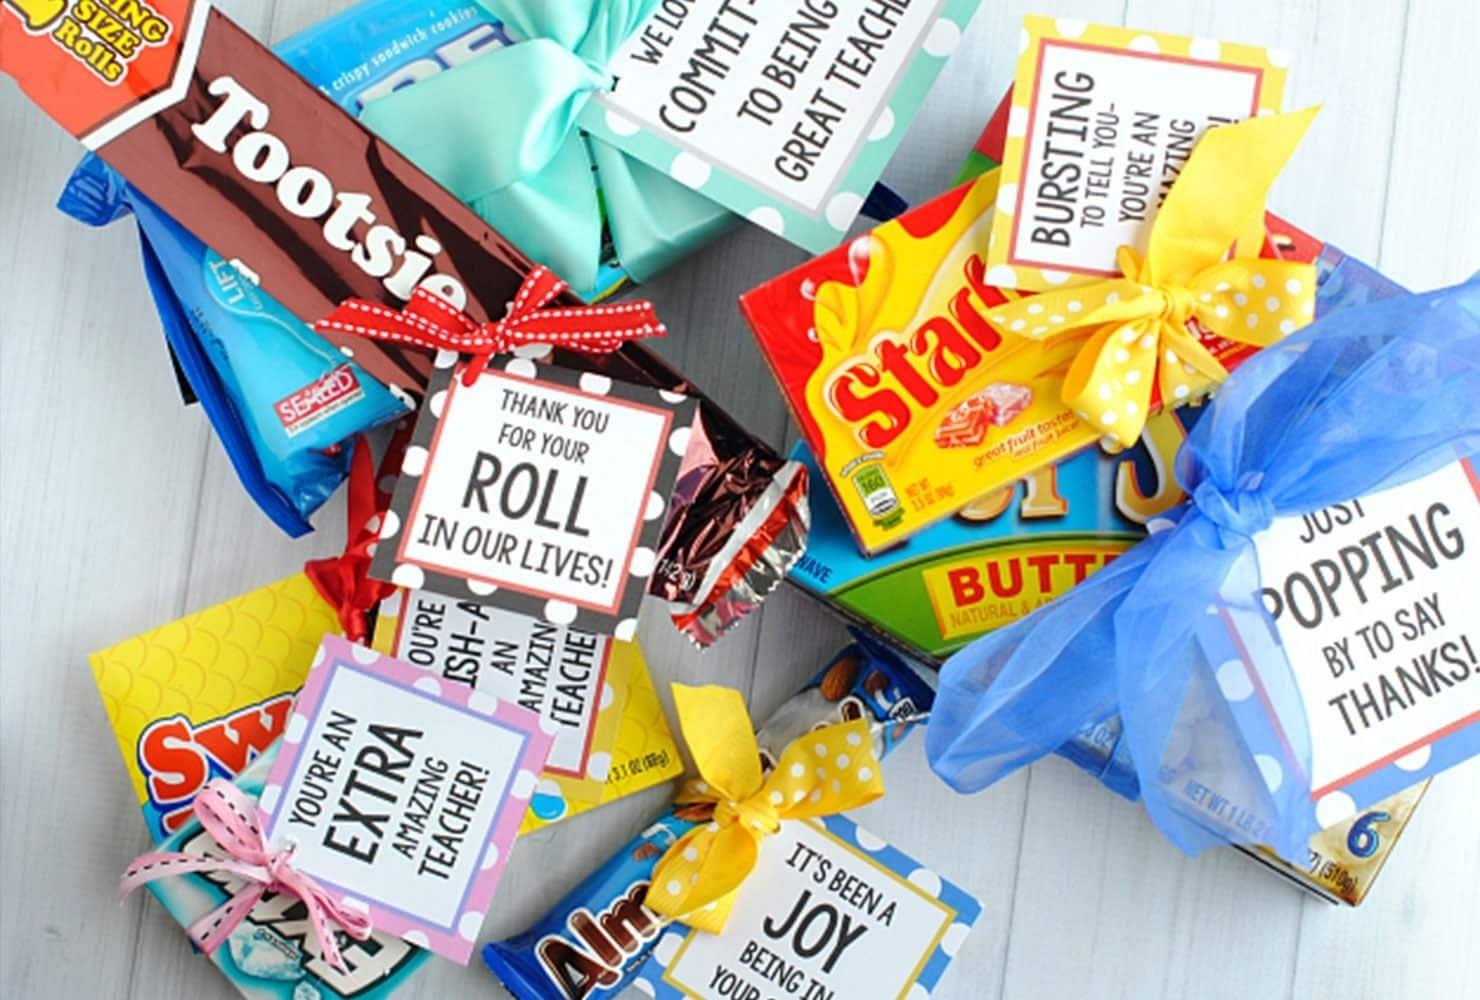 10 Attractive Teacher Appreciation Gift Ideas With Candy 55 teacher appreciation week gift ideas to say thanks shutterfly 8